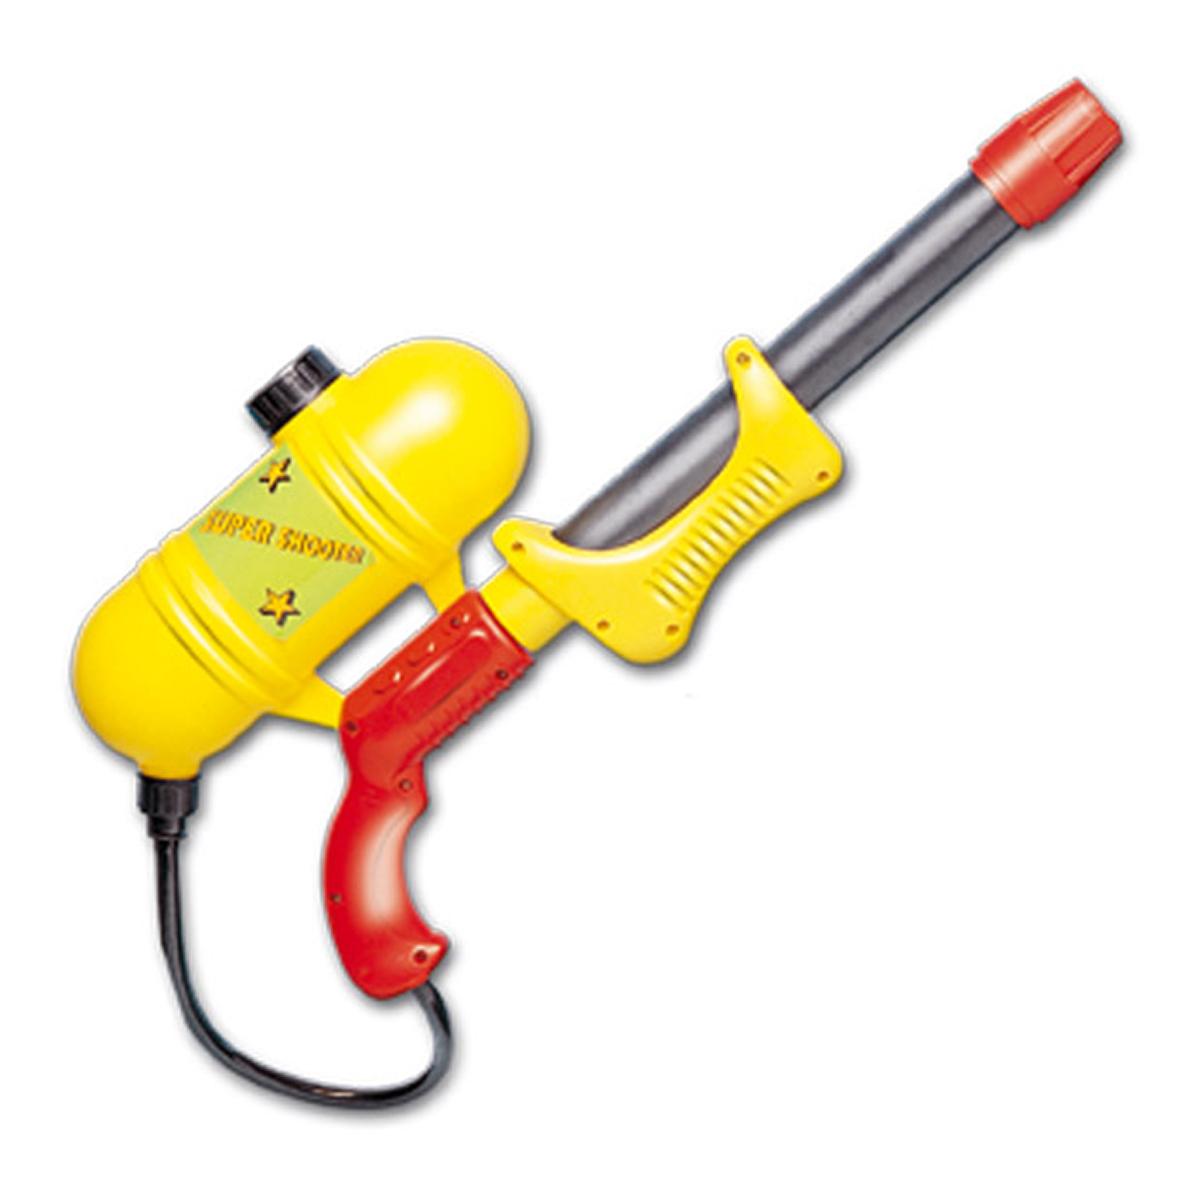 Pistol cu apa si 1 rezervor Dohany